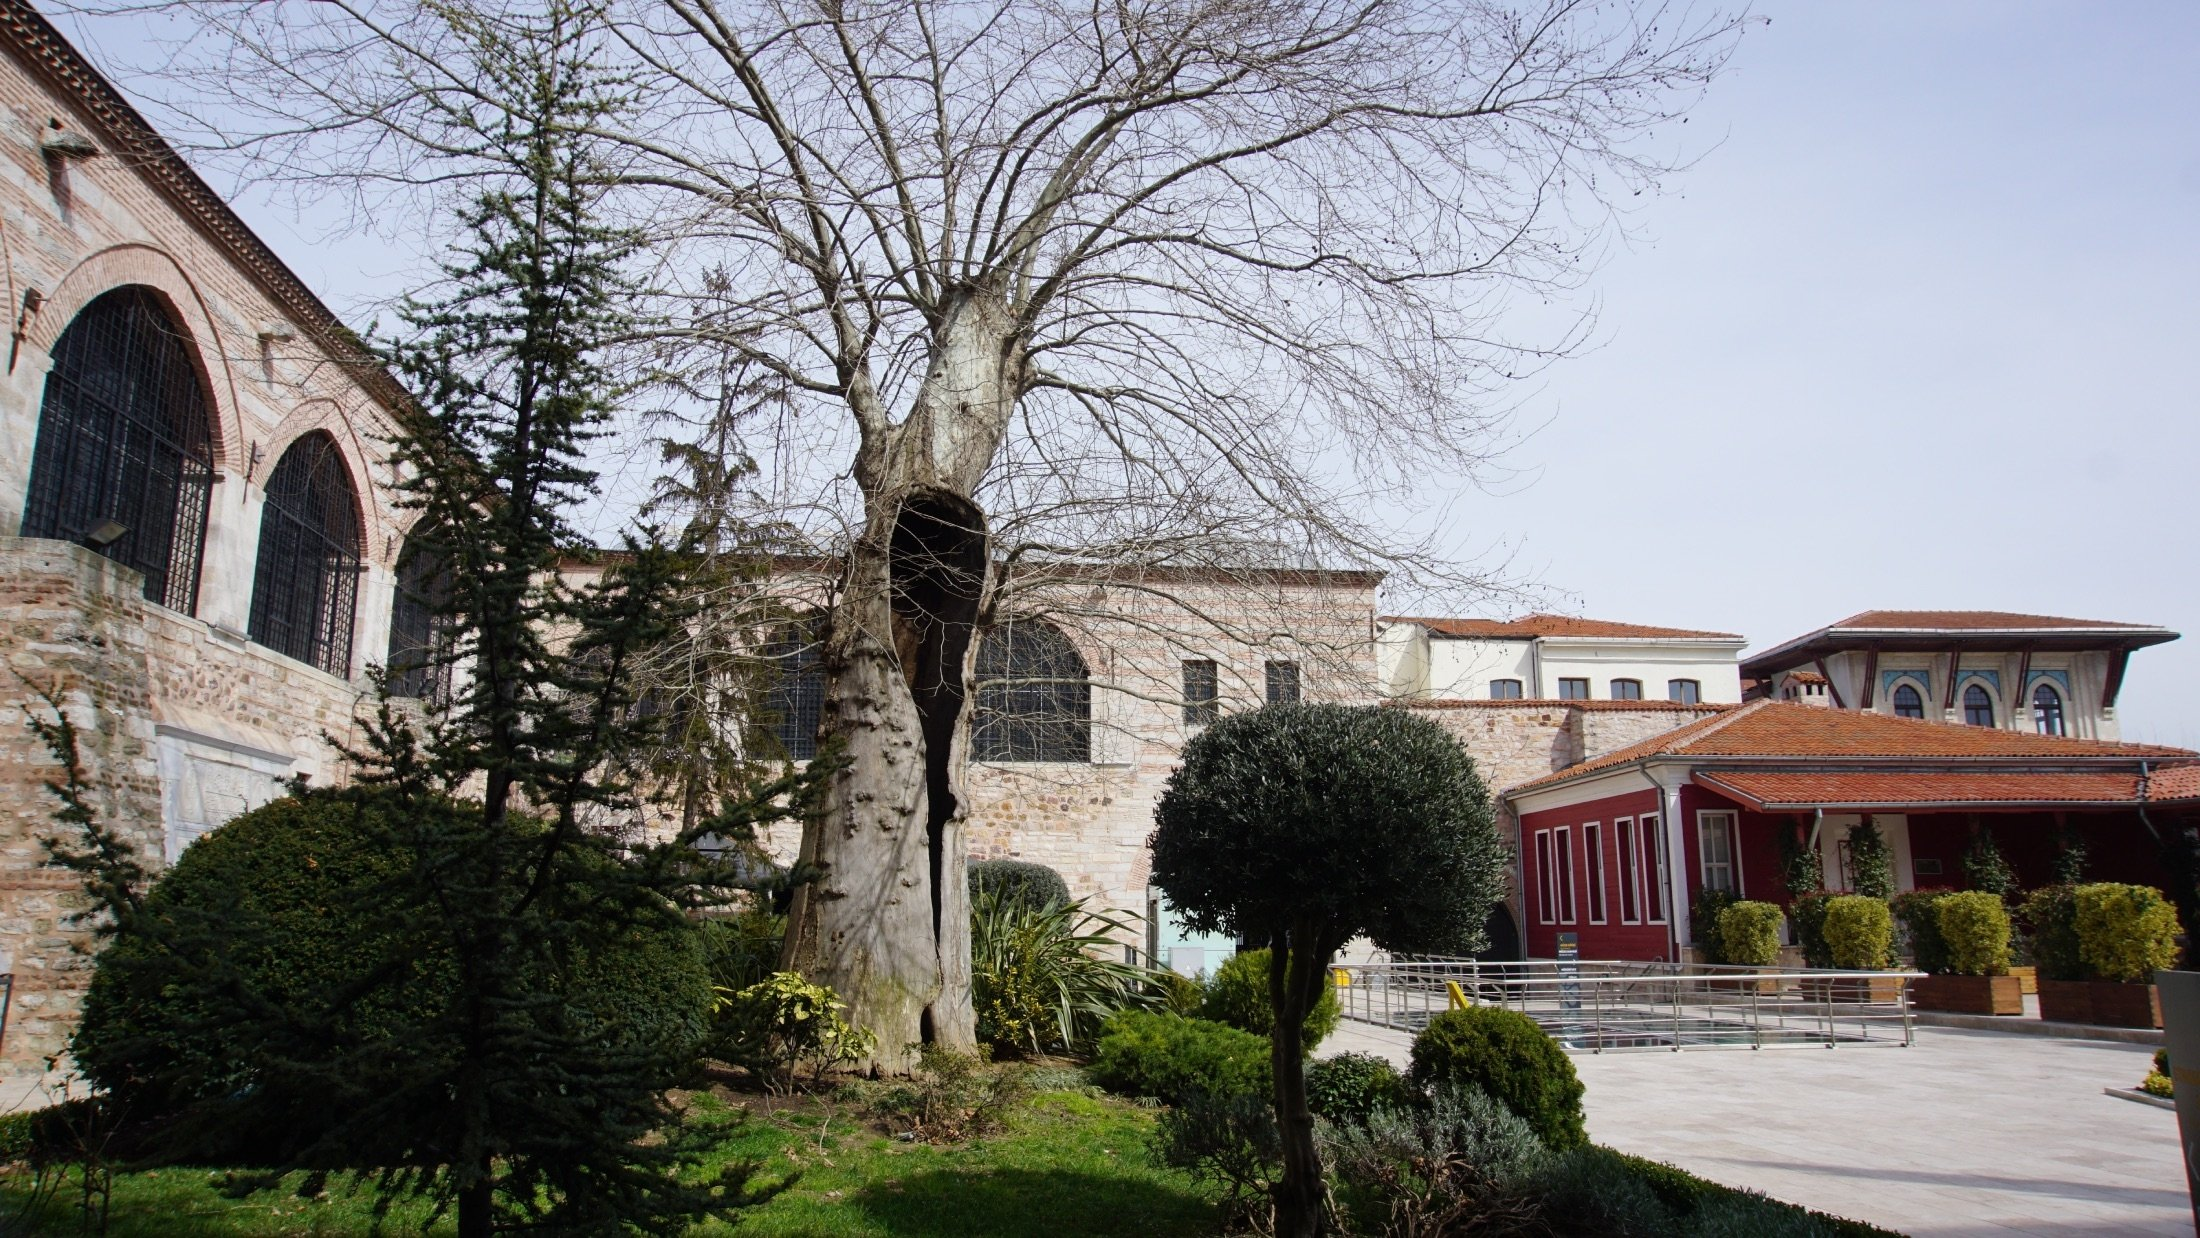 The courtyard of the Museum of Turkish and Islamic Arts. (Photo by Murat Tarık)